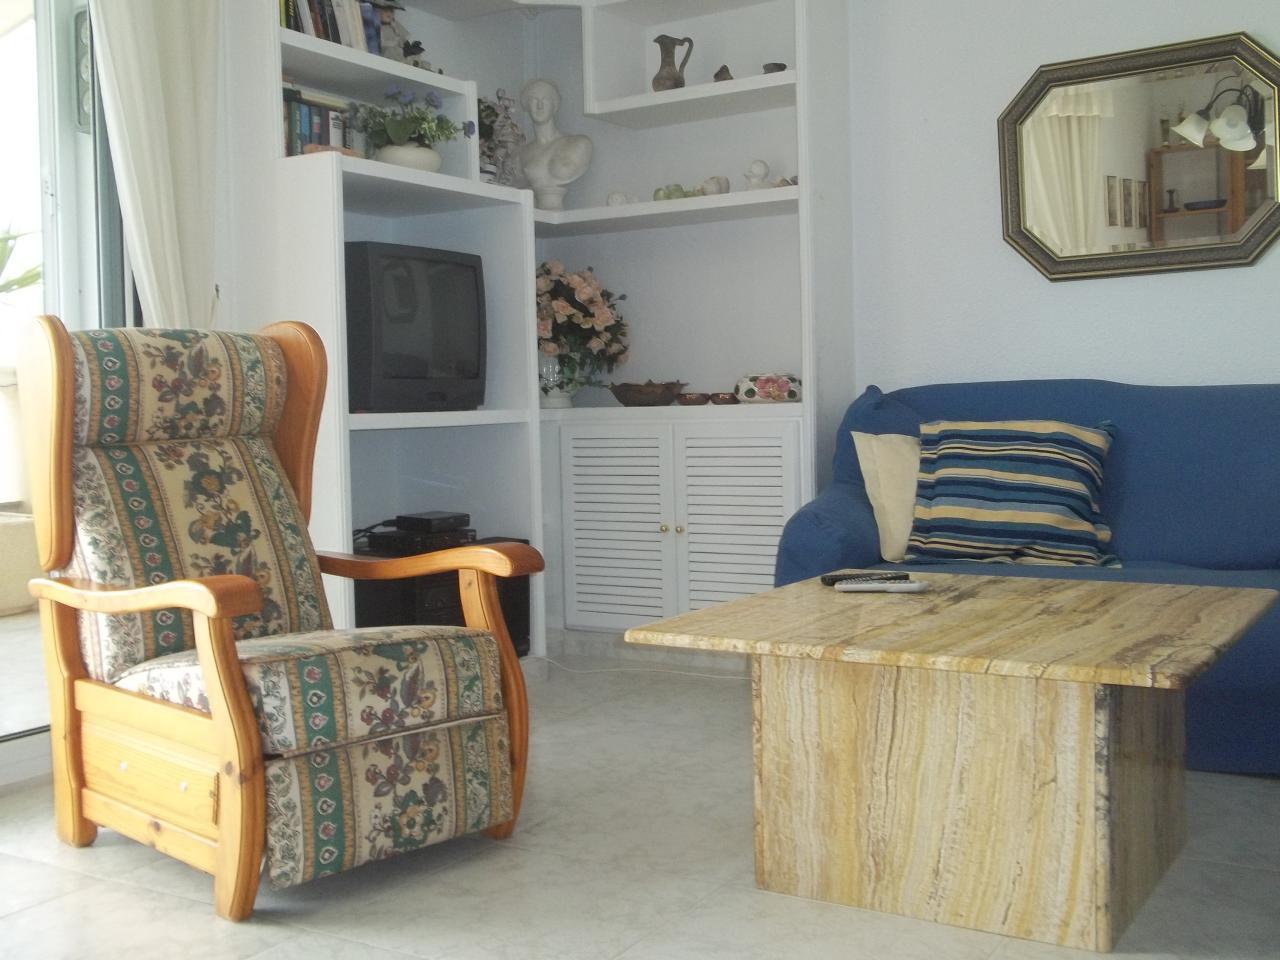 Appartement de vacances Casa Mónica (809602), La Manga del Mar Menor, Costa Calida, Murcie, Espagne, image 24